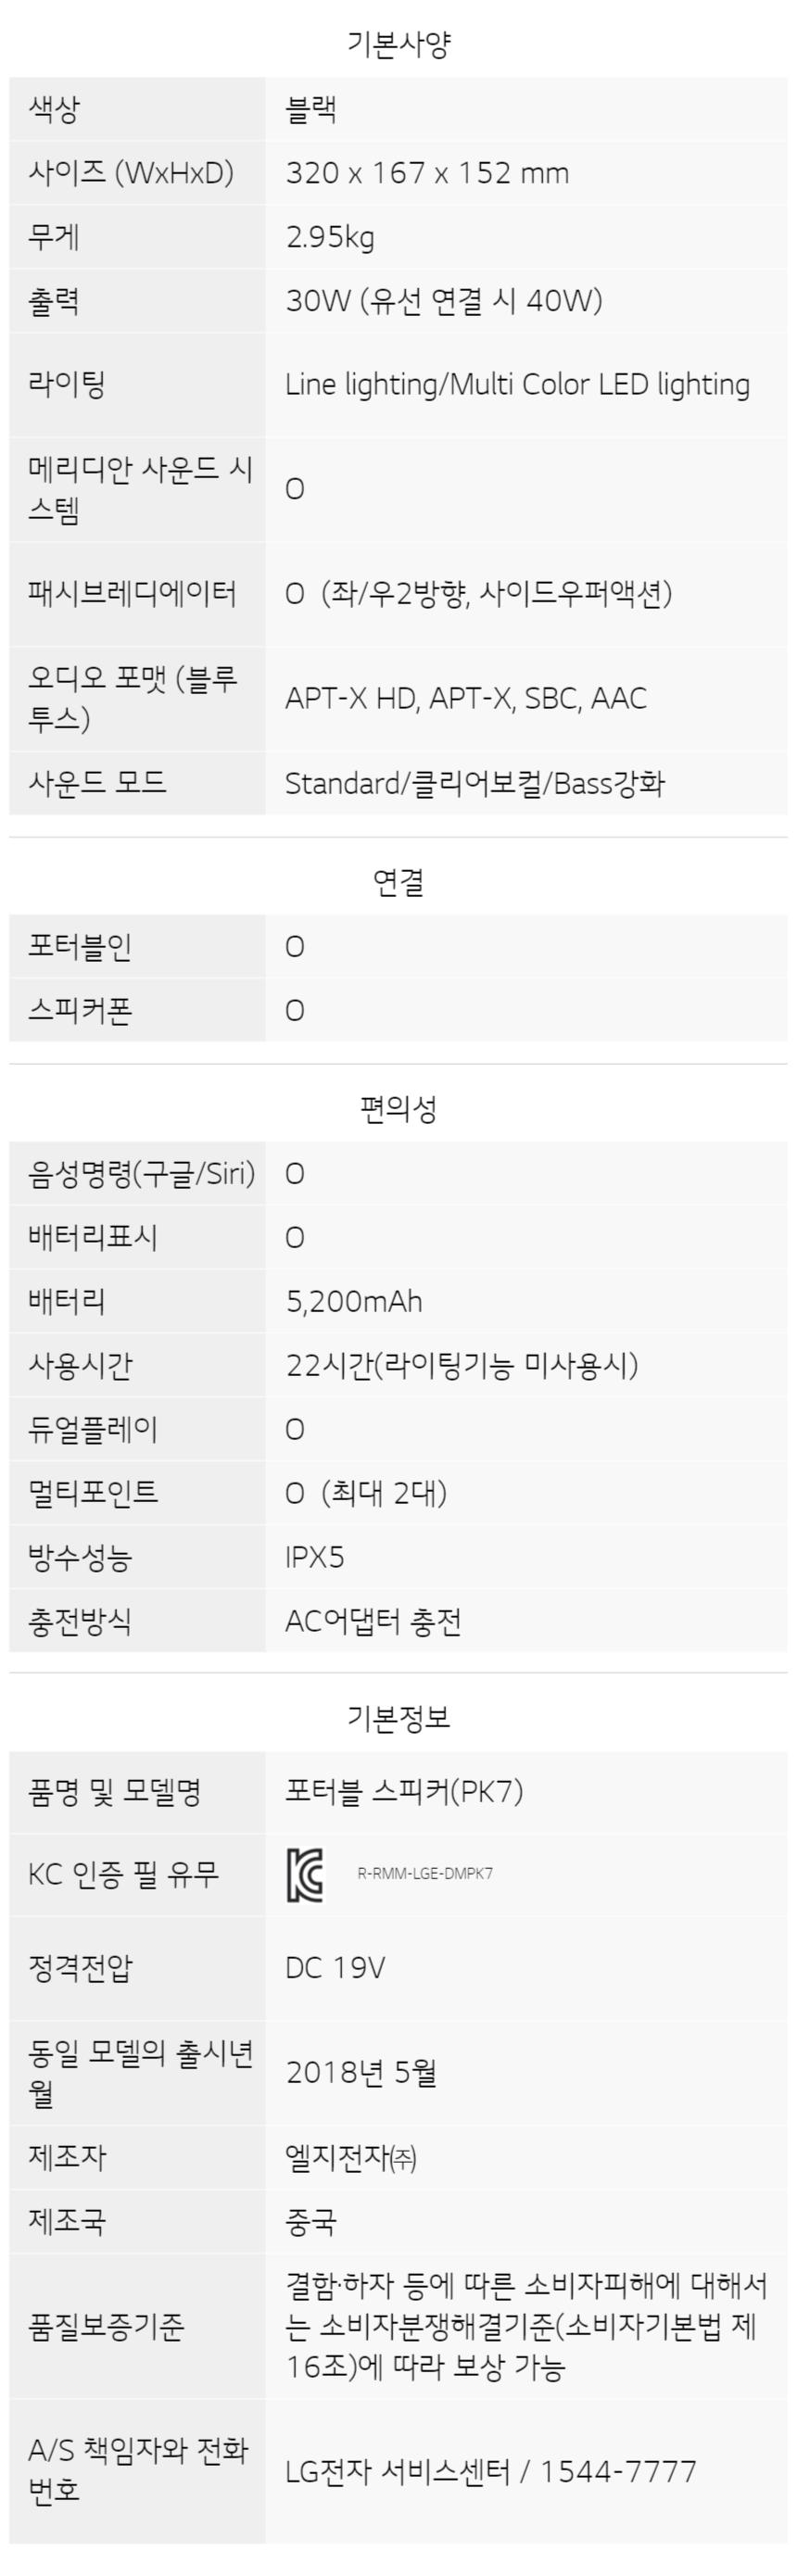 PK7 제품 사양